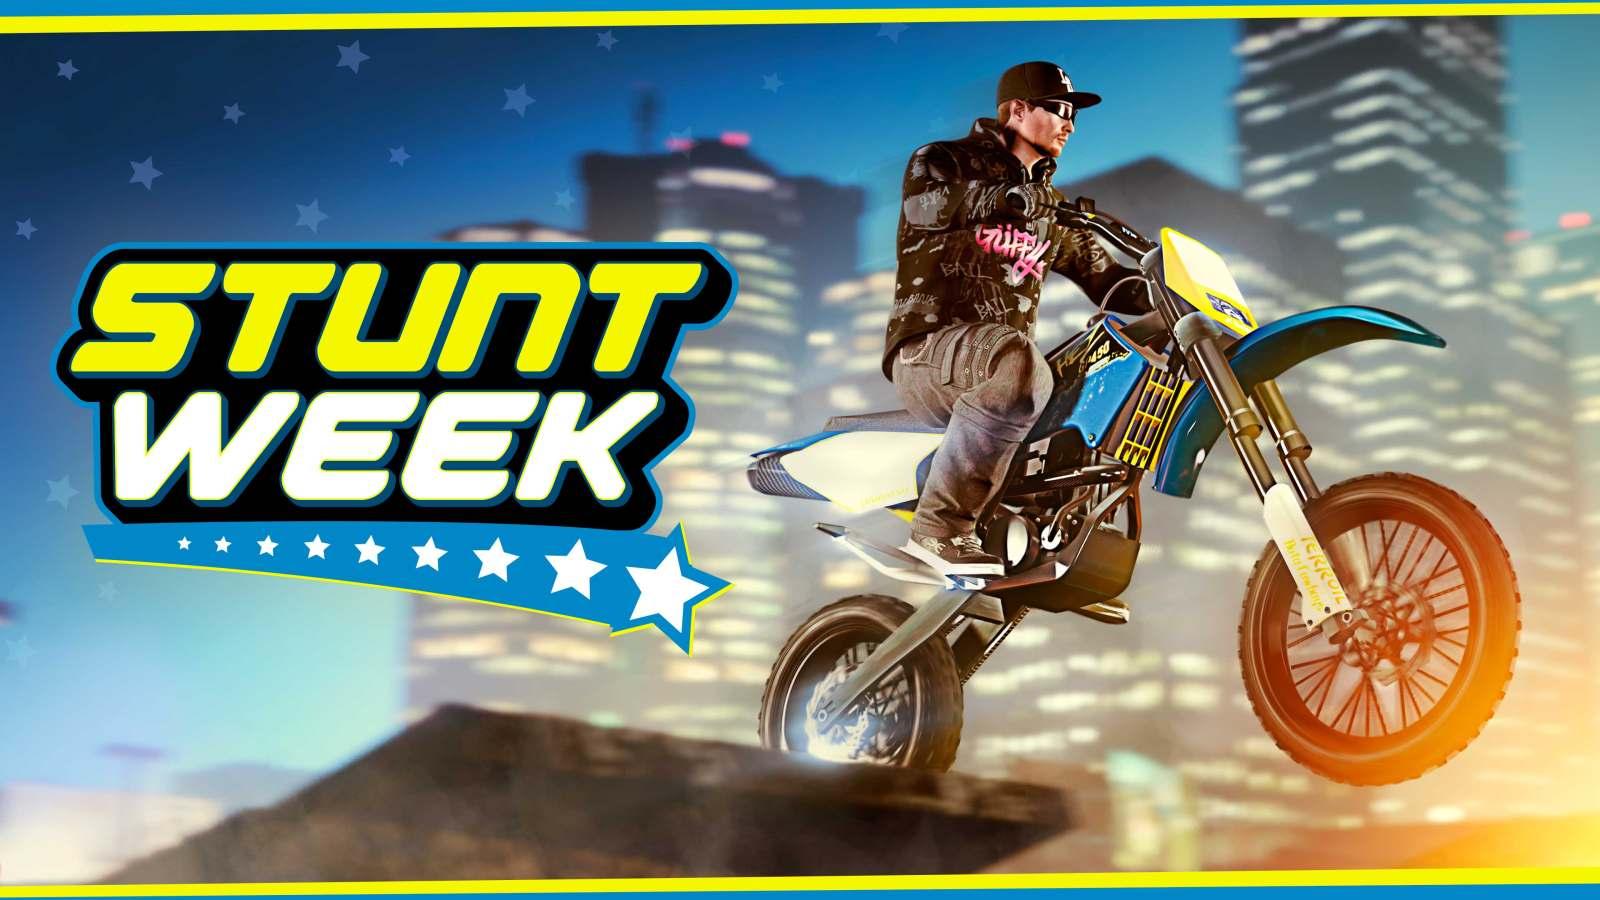 《GTA5》在线模式开启极限挑战周:完成飞车特技即可赚取50万游戏币